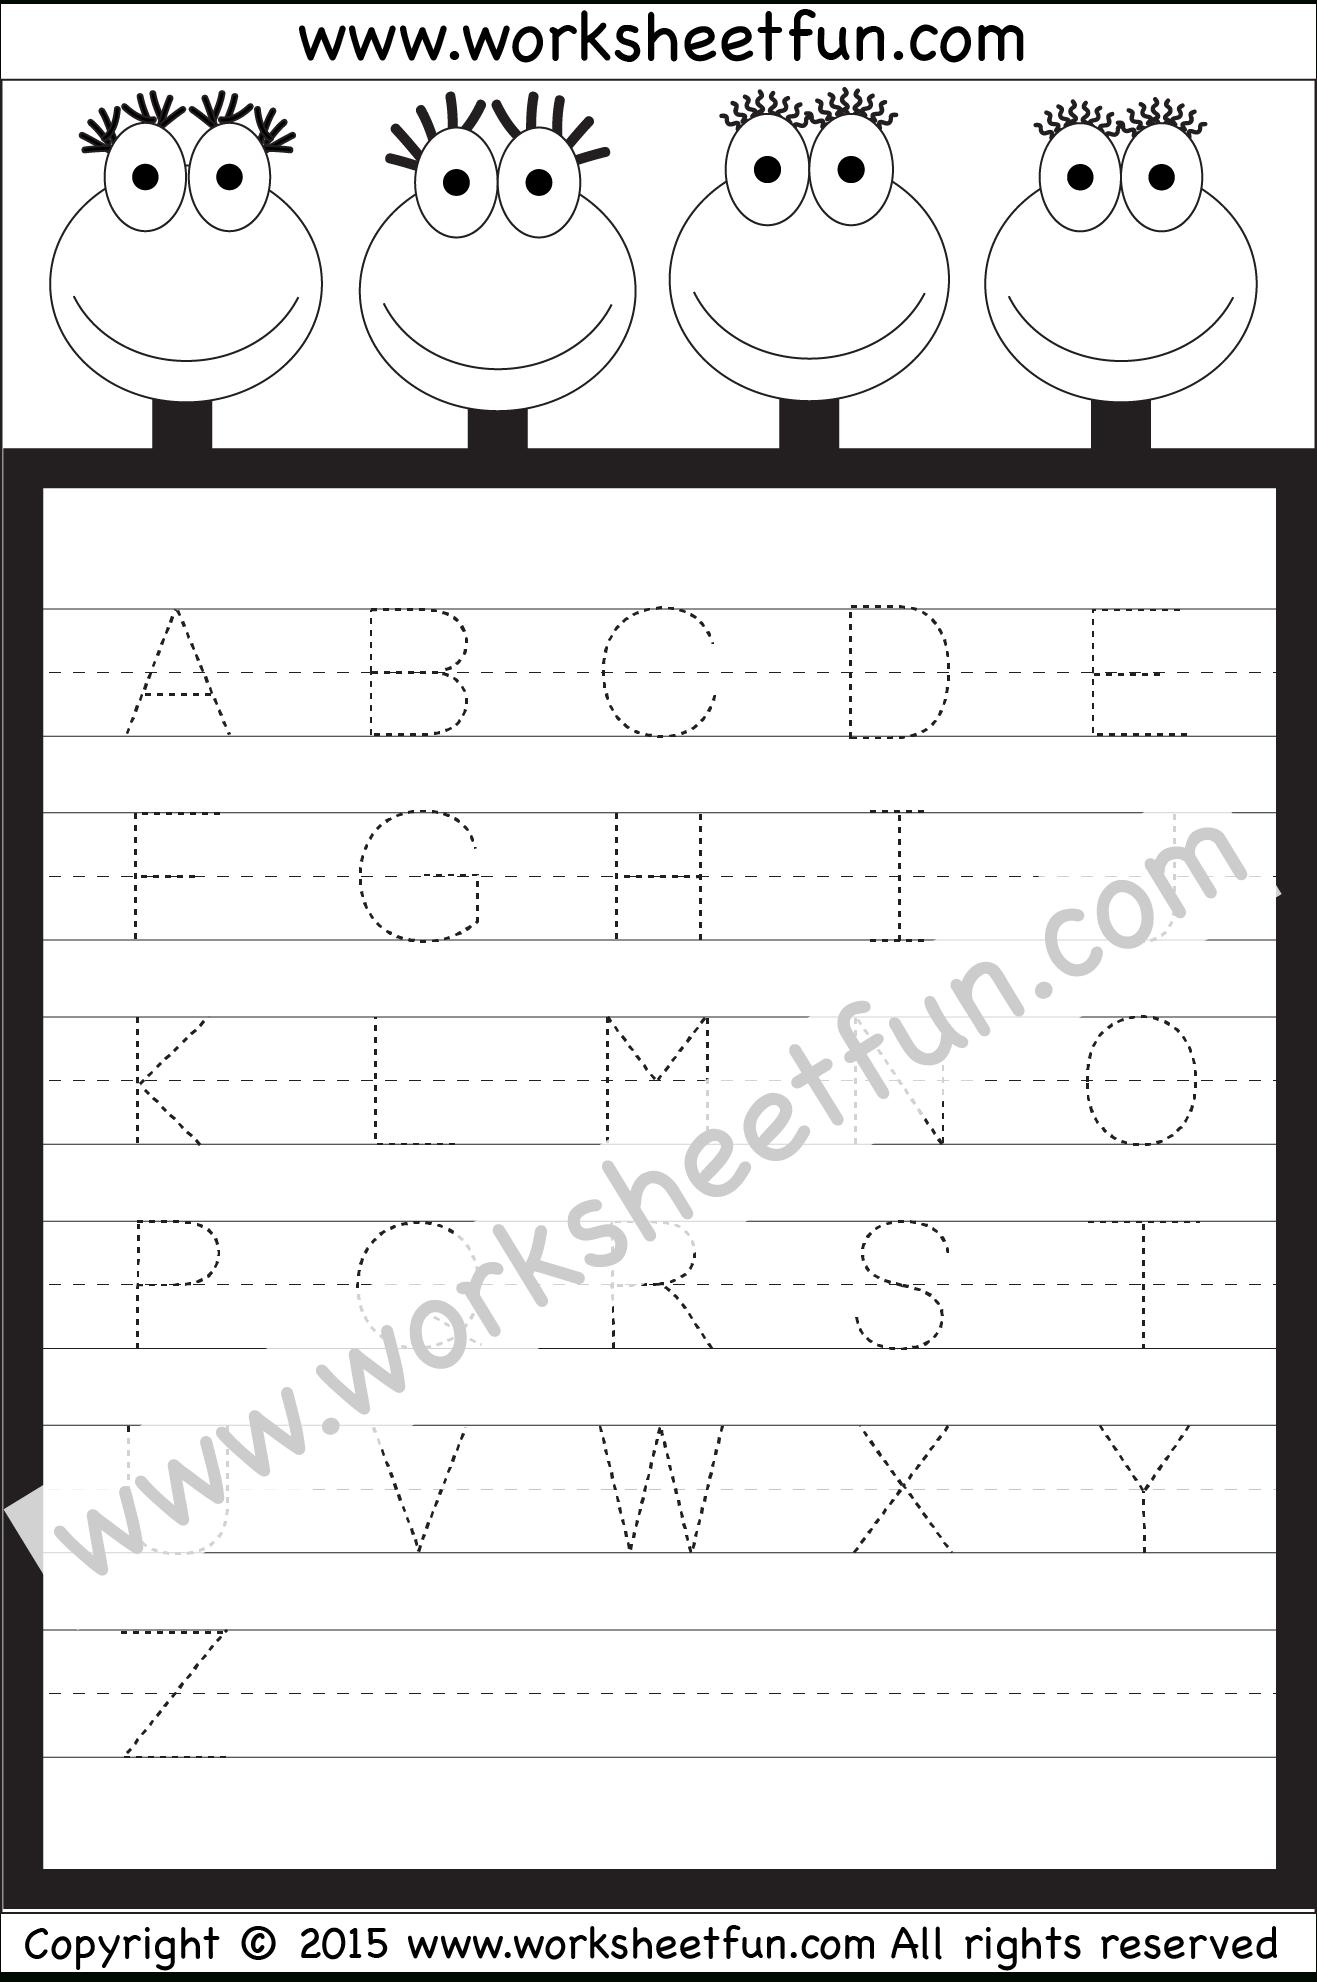 Letter Tracing Worksheet – Capital Letters / Free Printable regarding Alphabet Tracing Worksheets 1-10 Pdf